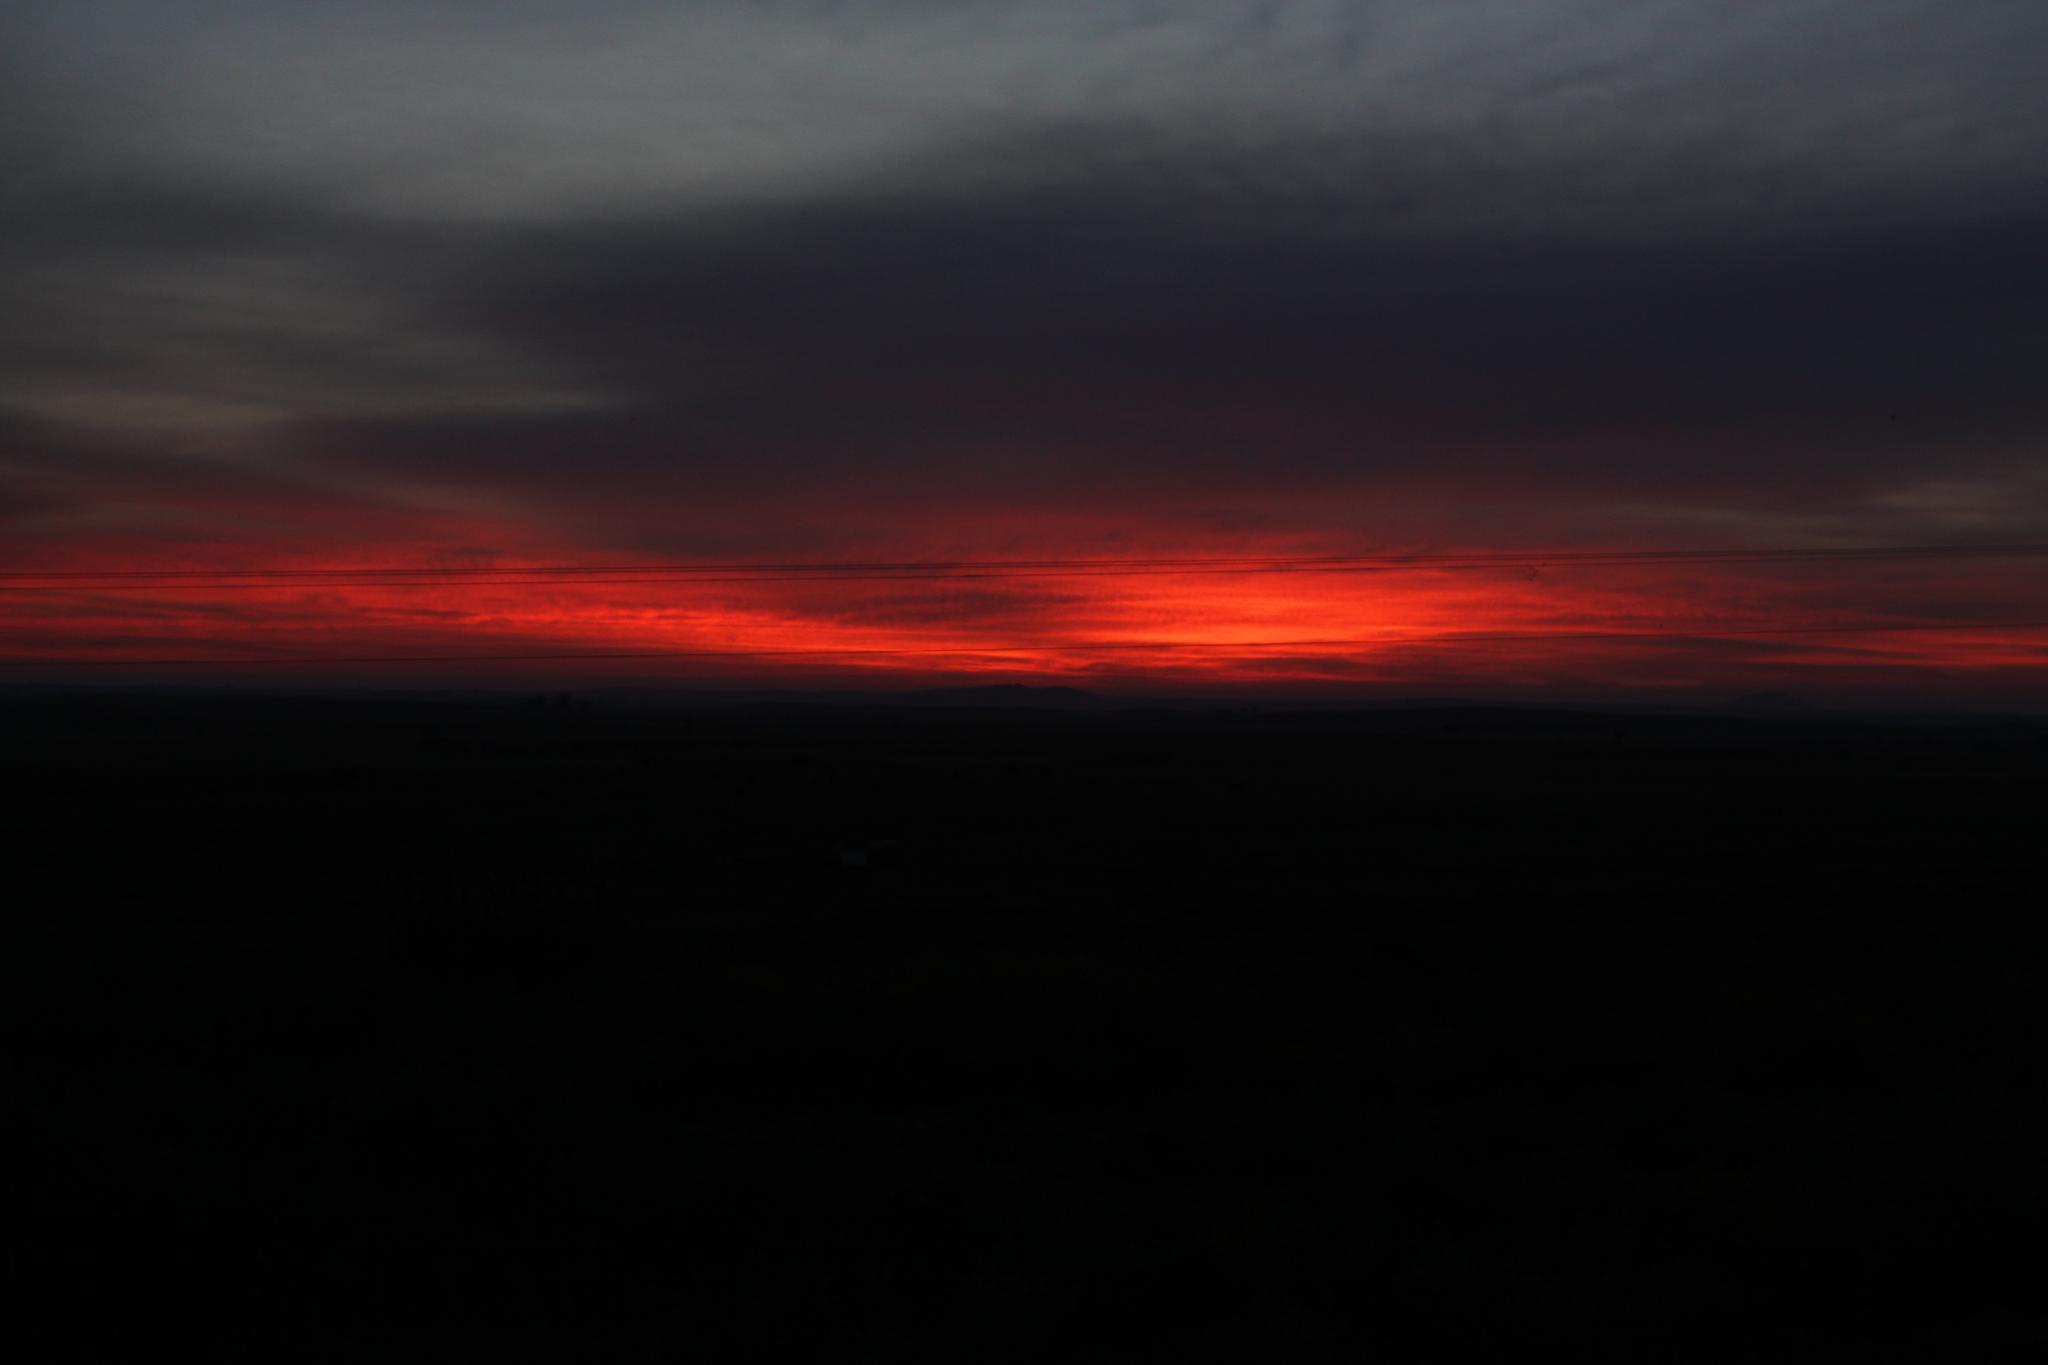 sunrise by pauladevasconcelos